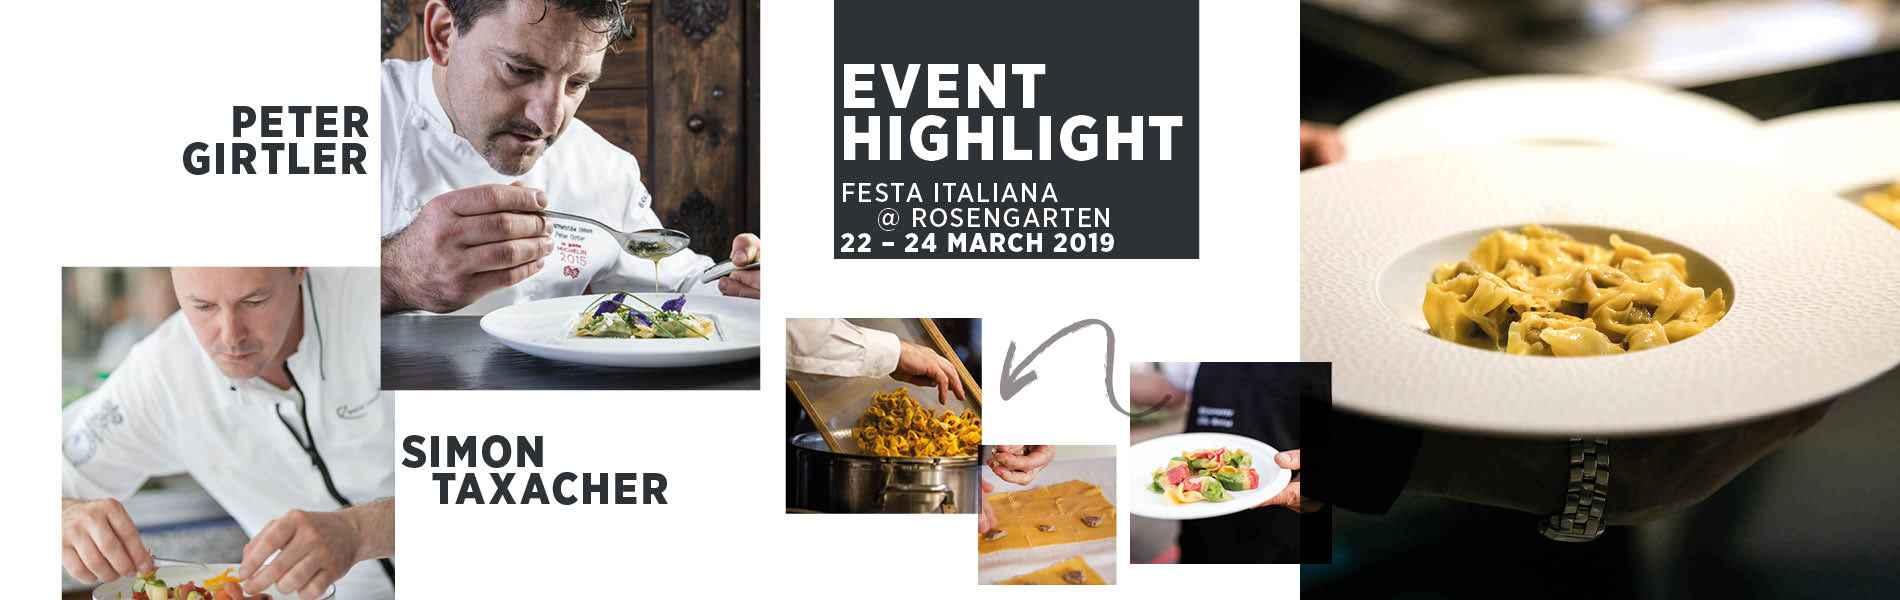 EVENT HIGHLIGHT Simon Taxacher and Peter Girtler at Relais Chateaux Rosengarten Tyrol Austria